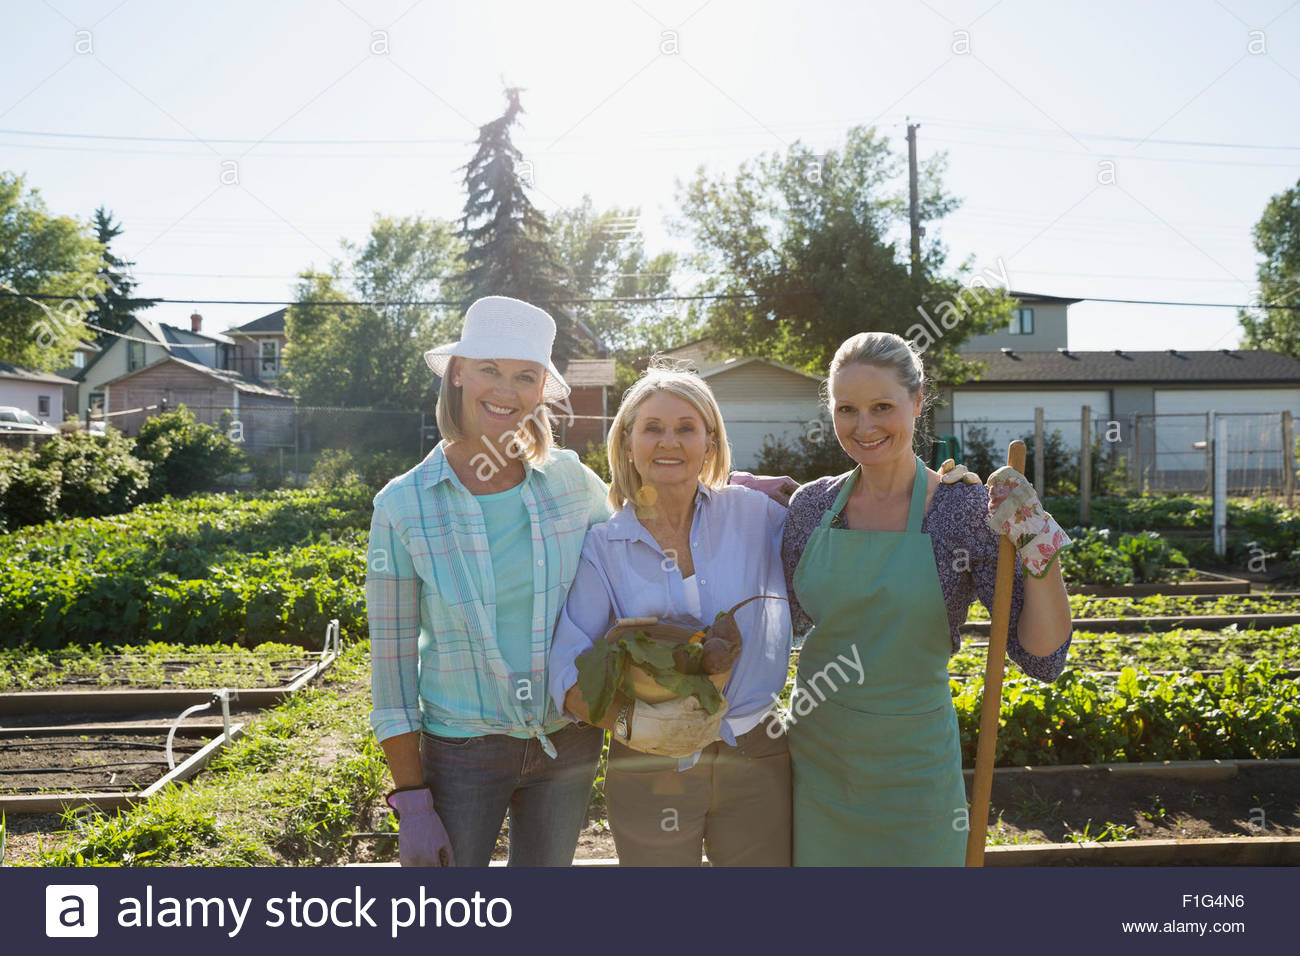 Portrait smiling women in sunny community vegetable garden - Stock Image